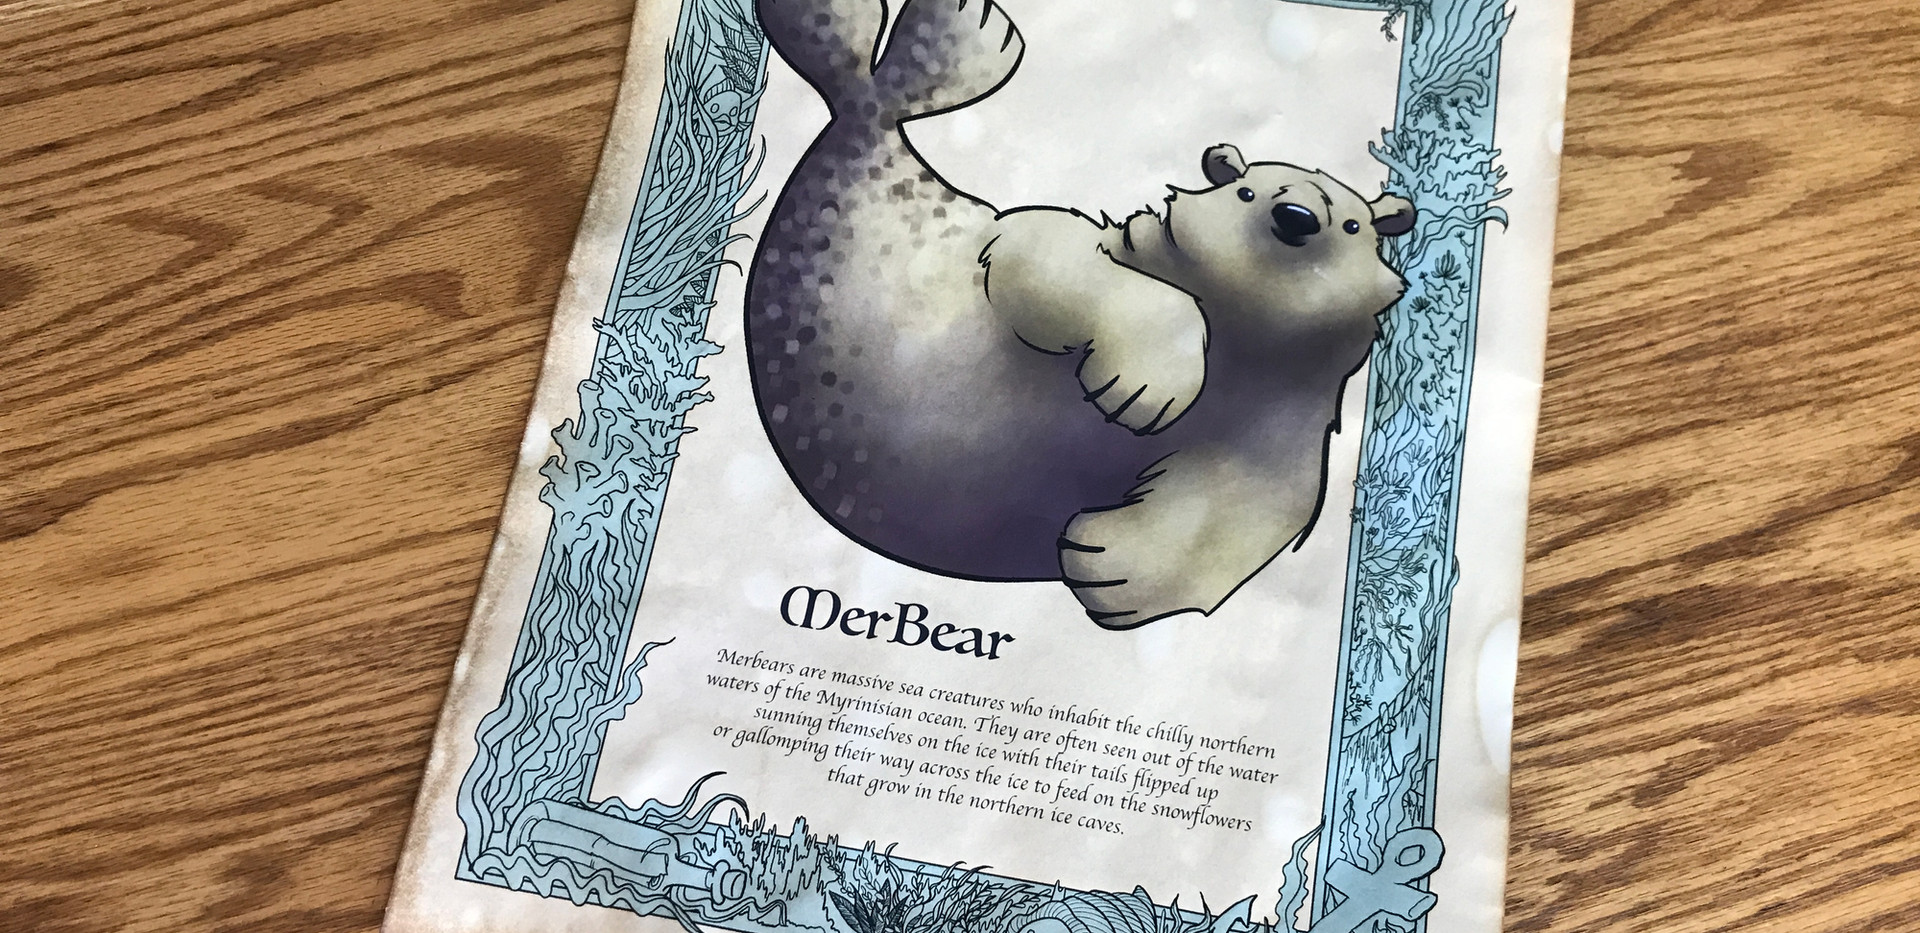 Merbear